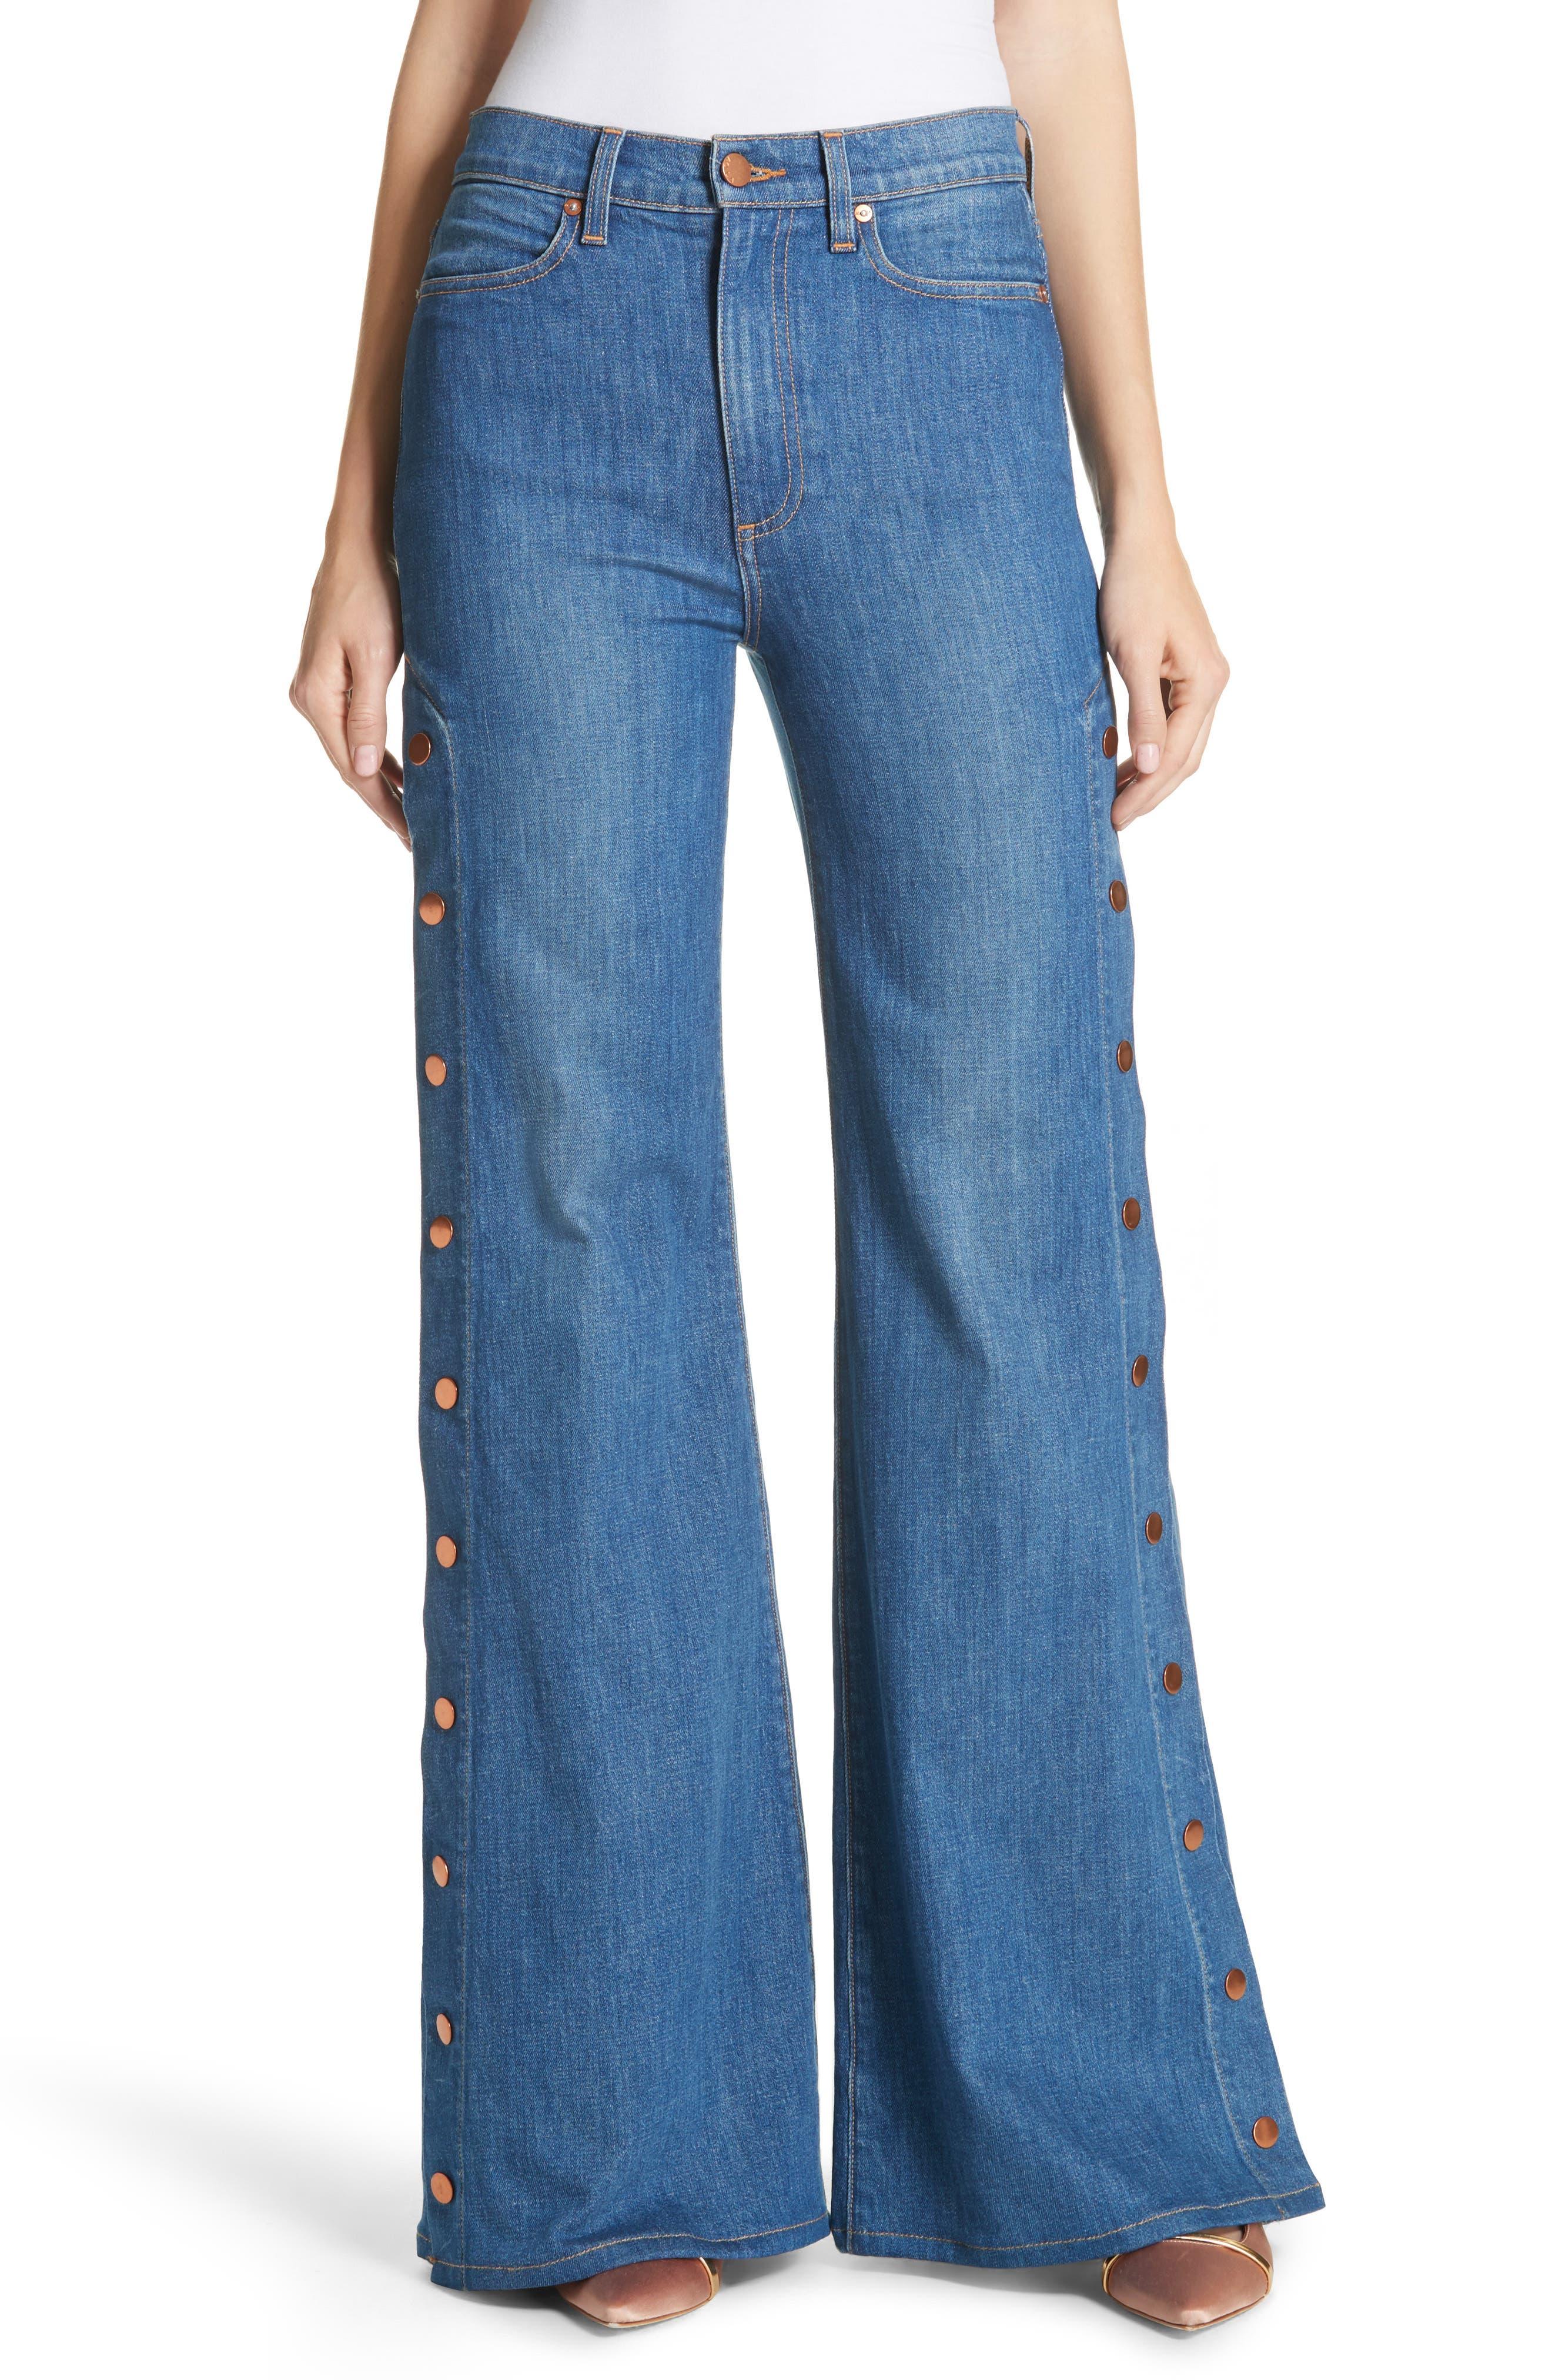 AO.LA Gorgeous Snap Side Flare Leg Jeans,                         Main,                         color, French Blue